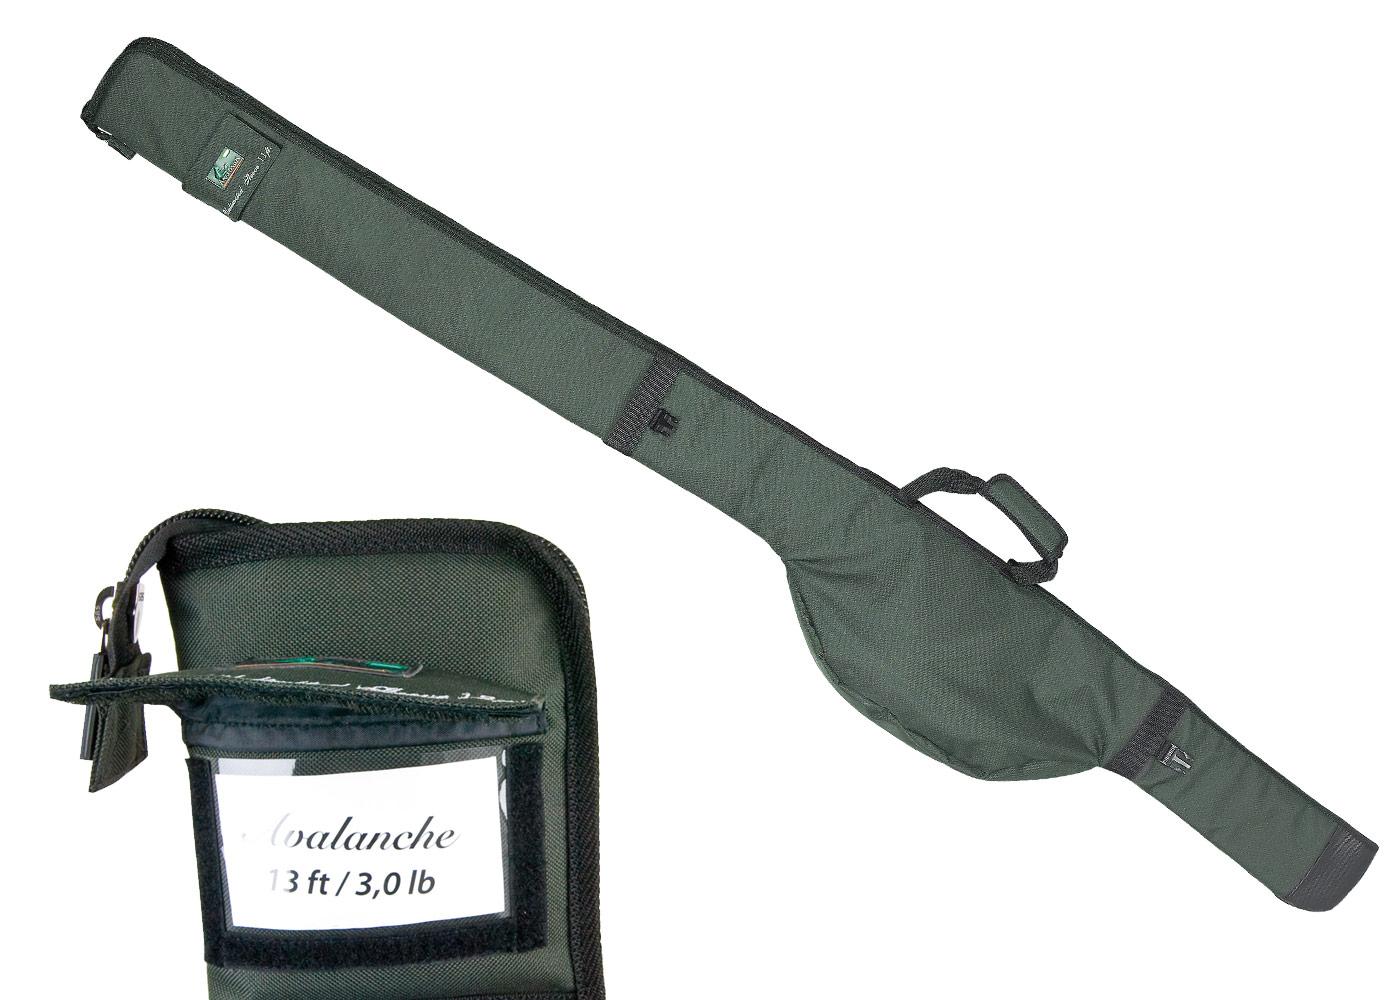 Anaconda Unlimited Sleeve 9ft 150cm